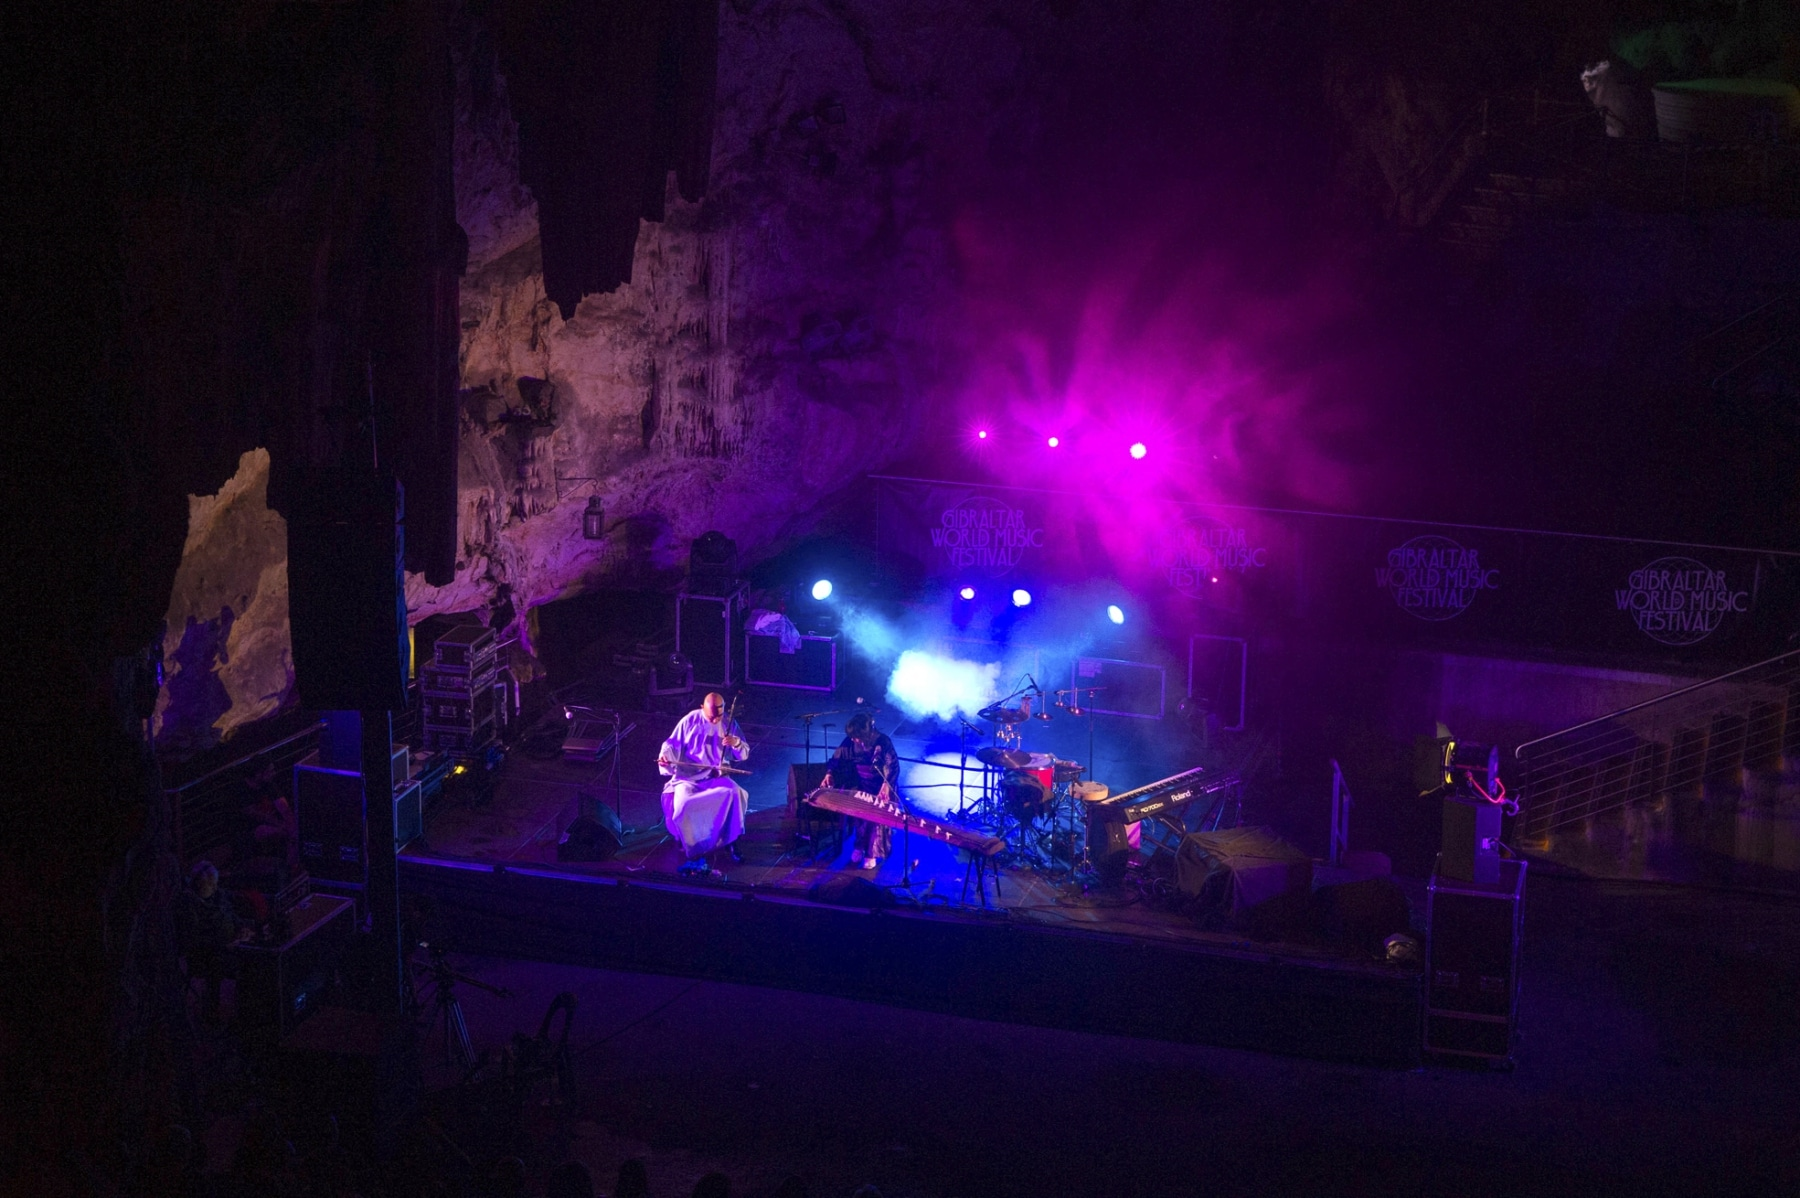 19-mayo-gibraltar-world-music-festival01_14463022722_o